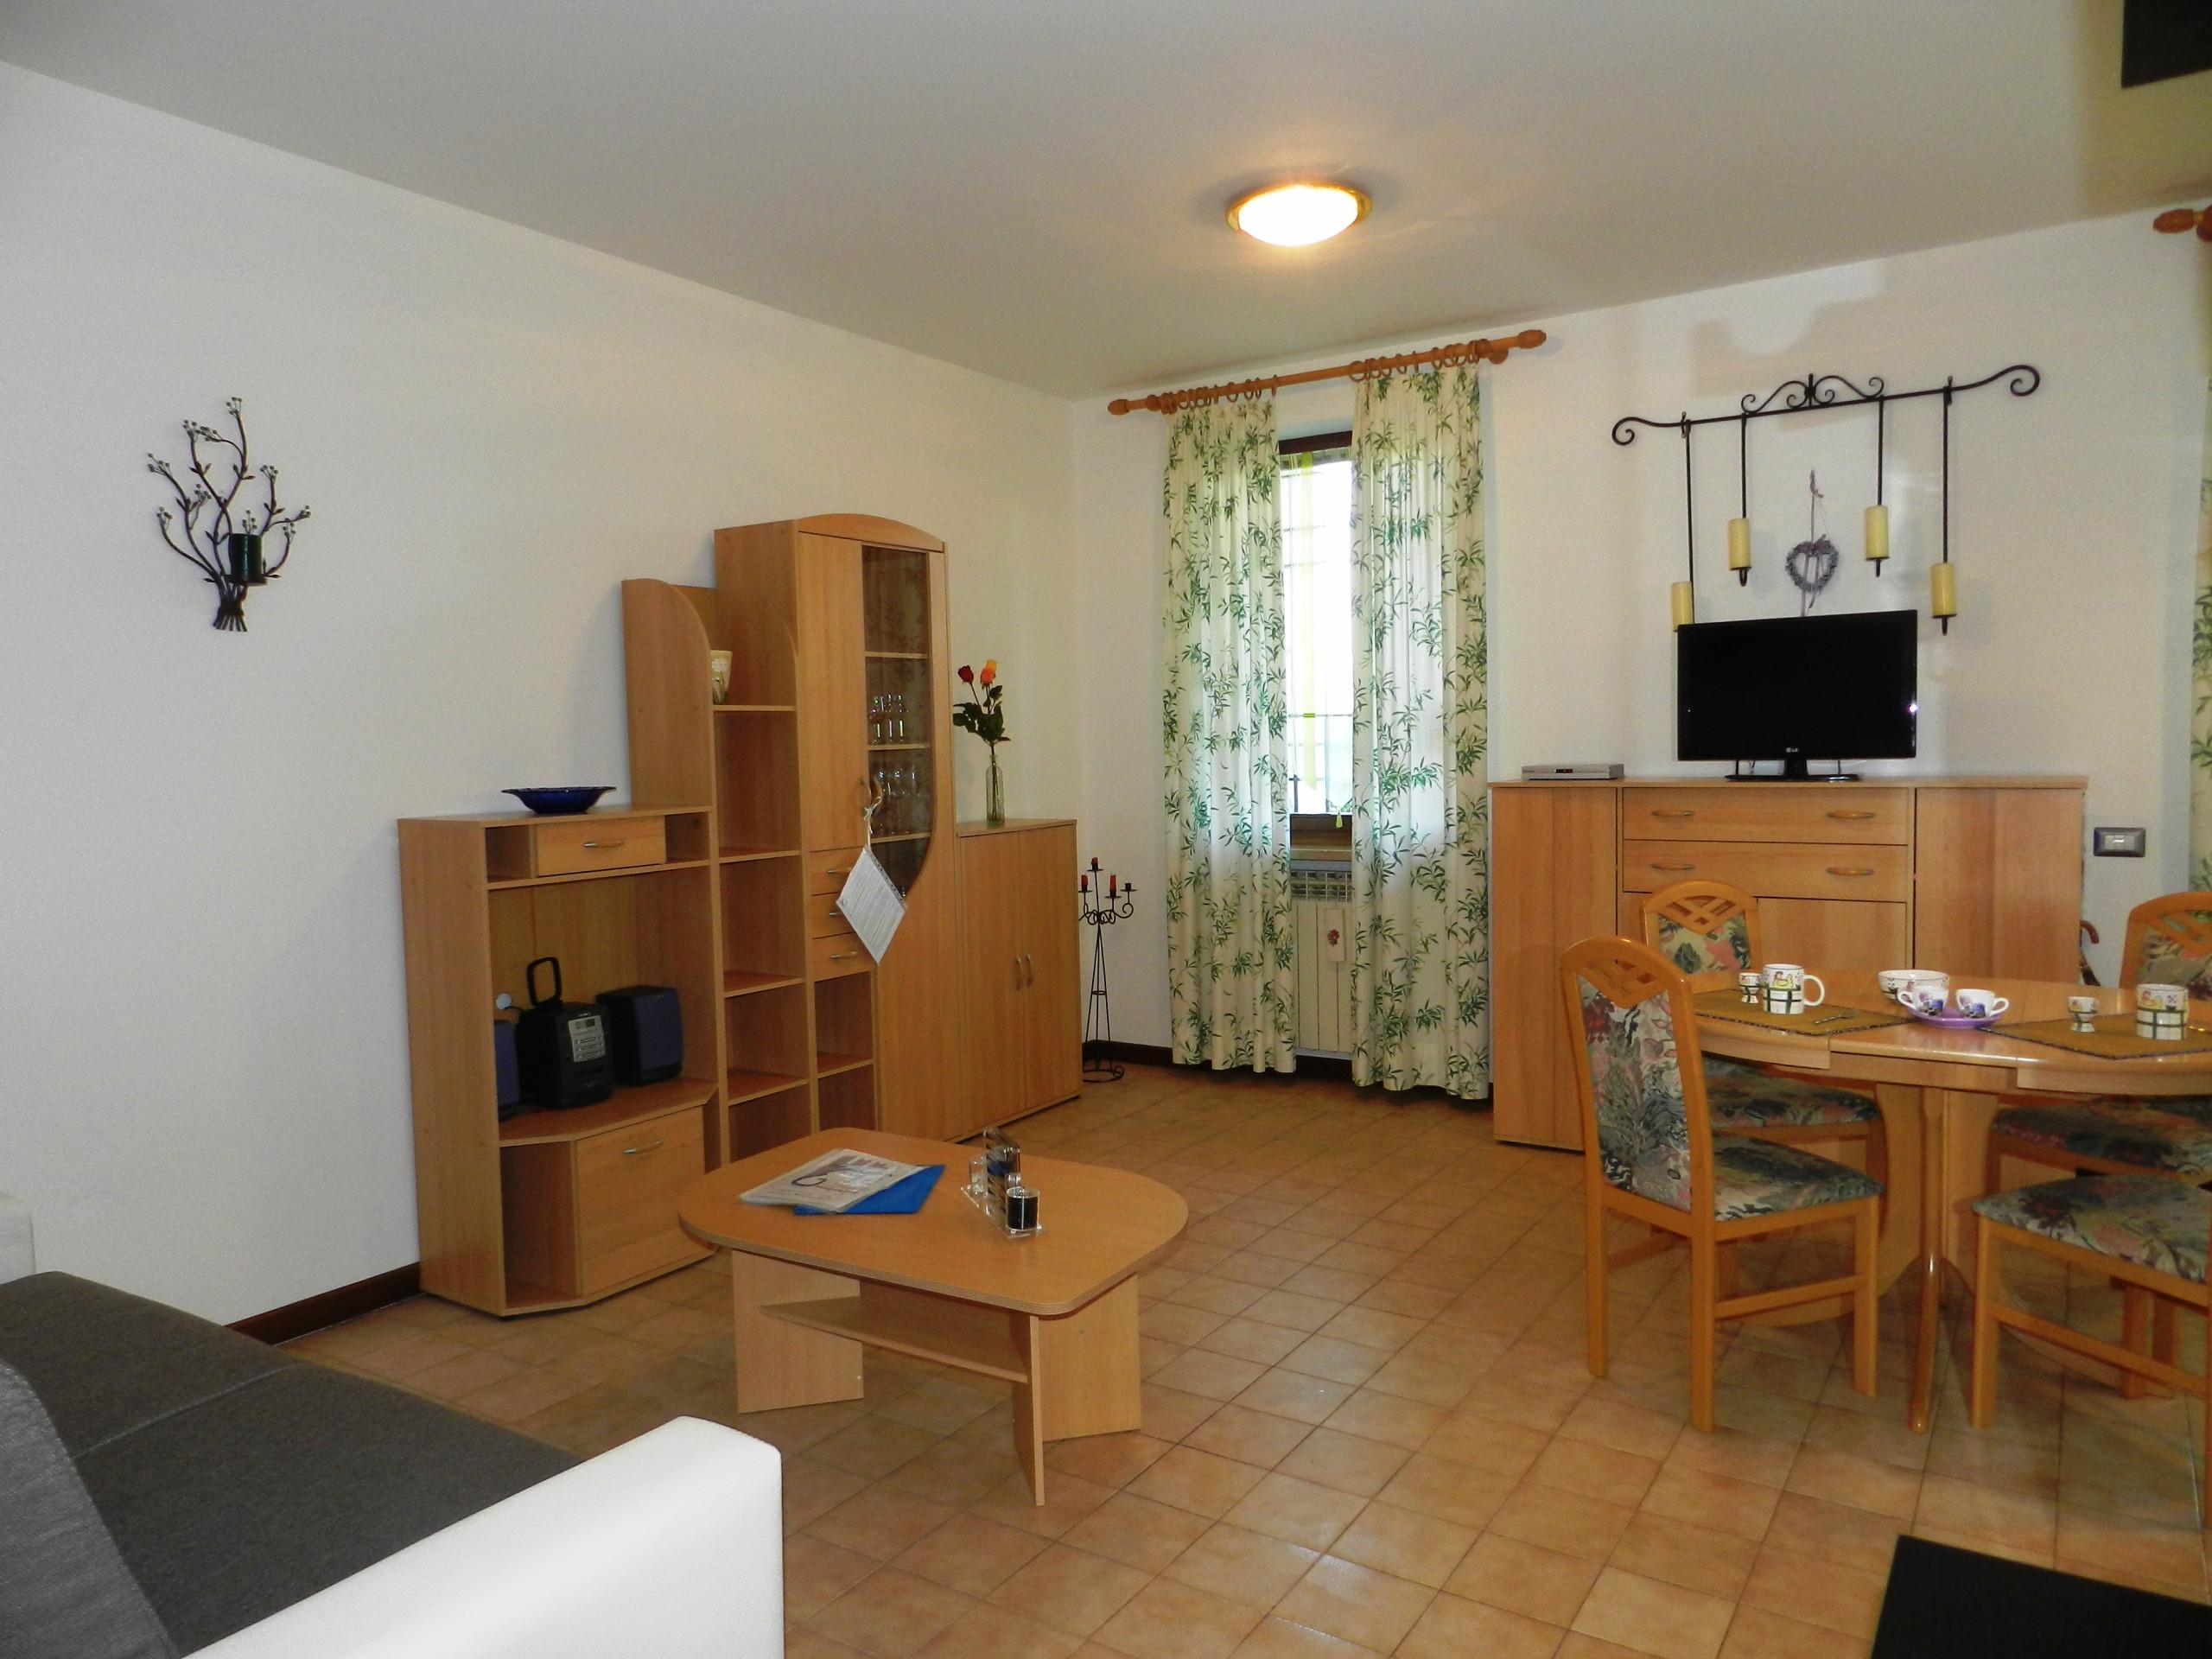 Appartamenti in Lazise - BILOCALE \